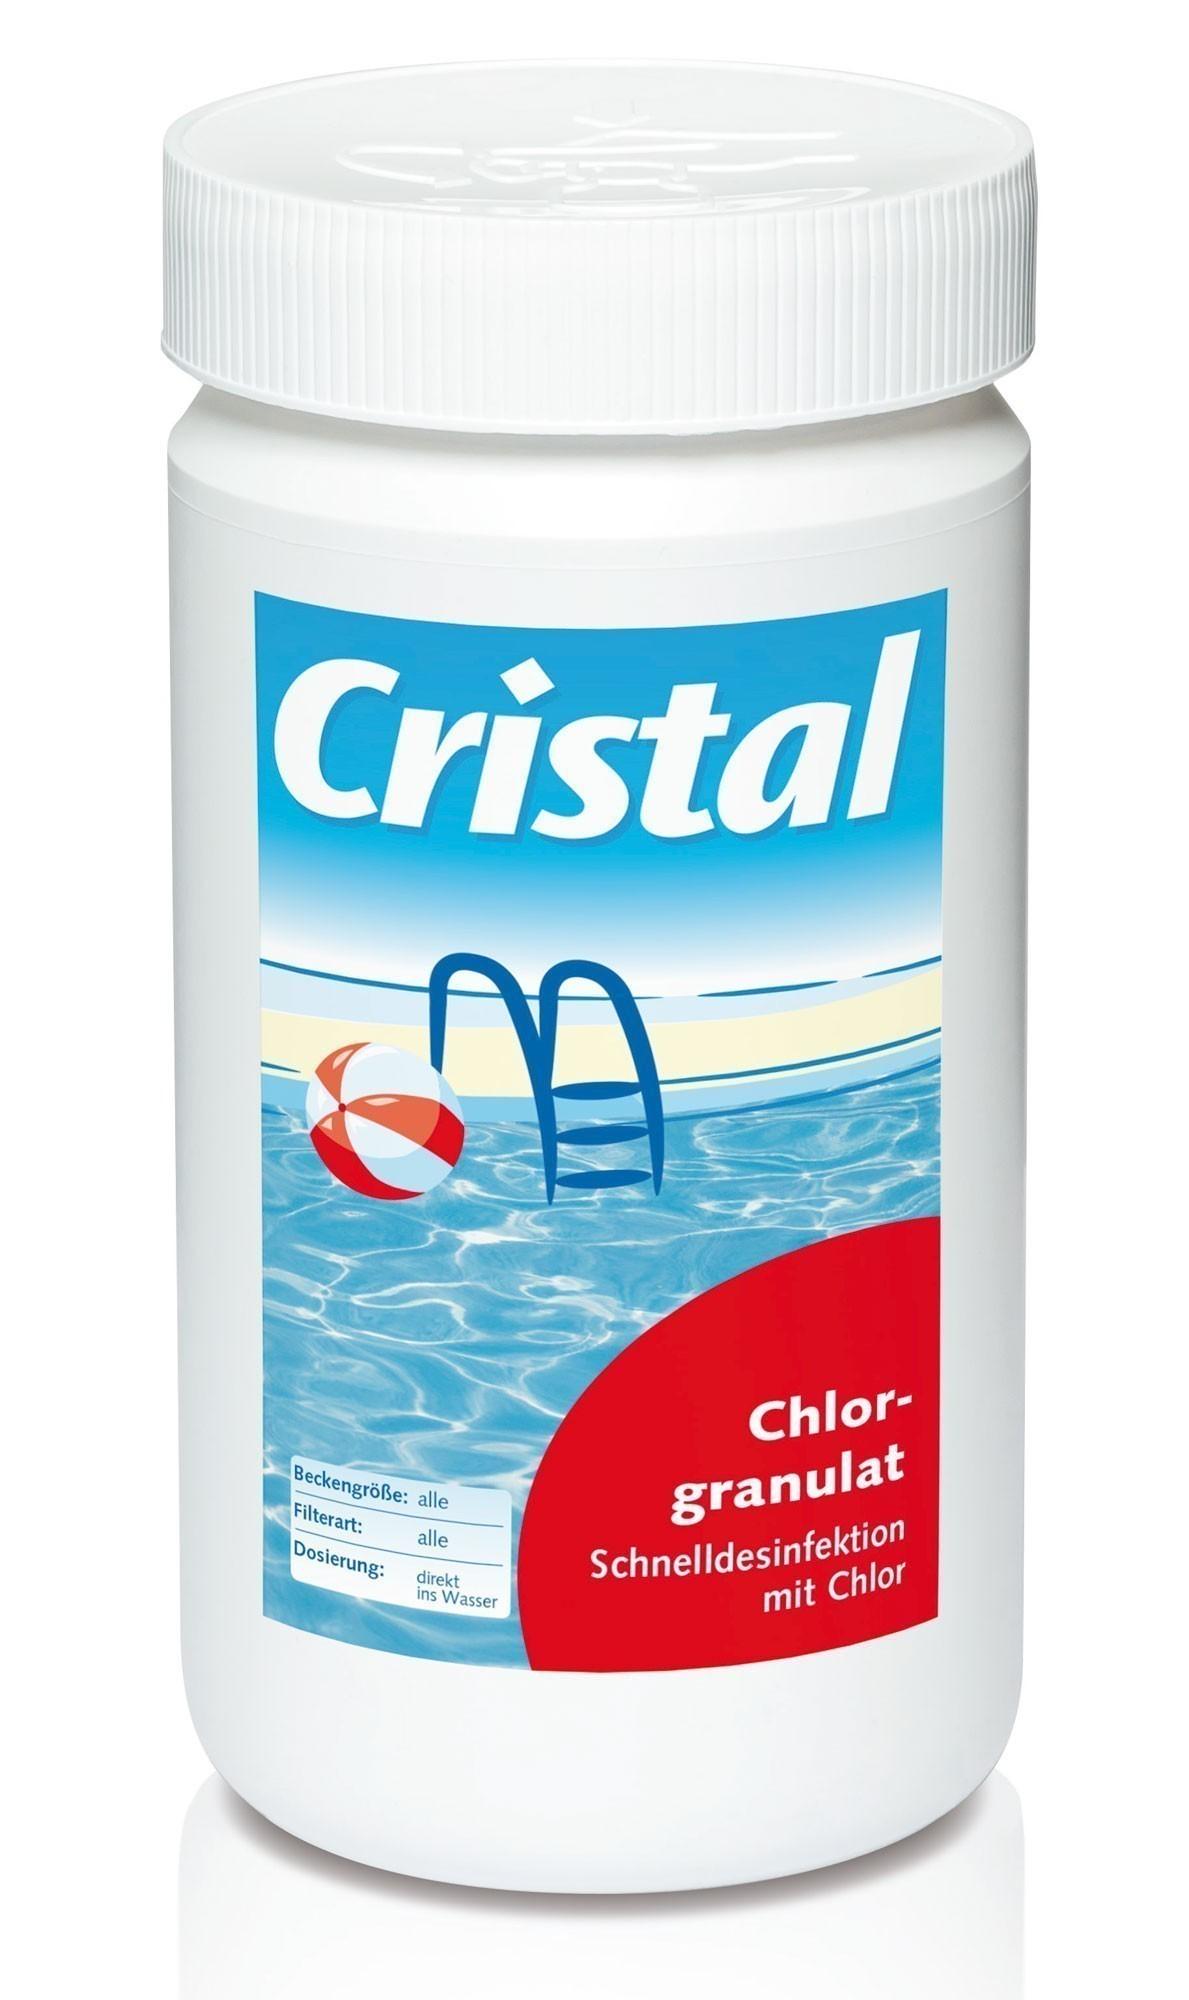 Cristal Wasserpflege Chlorgranulat 1 kg Bild 1